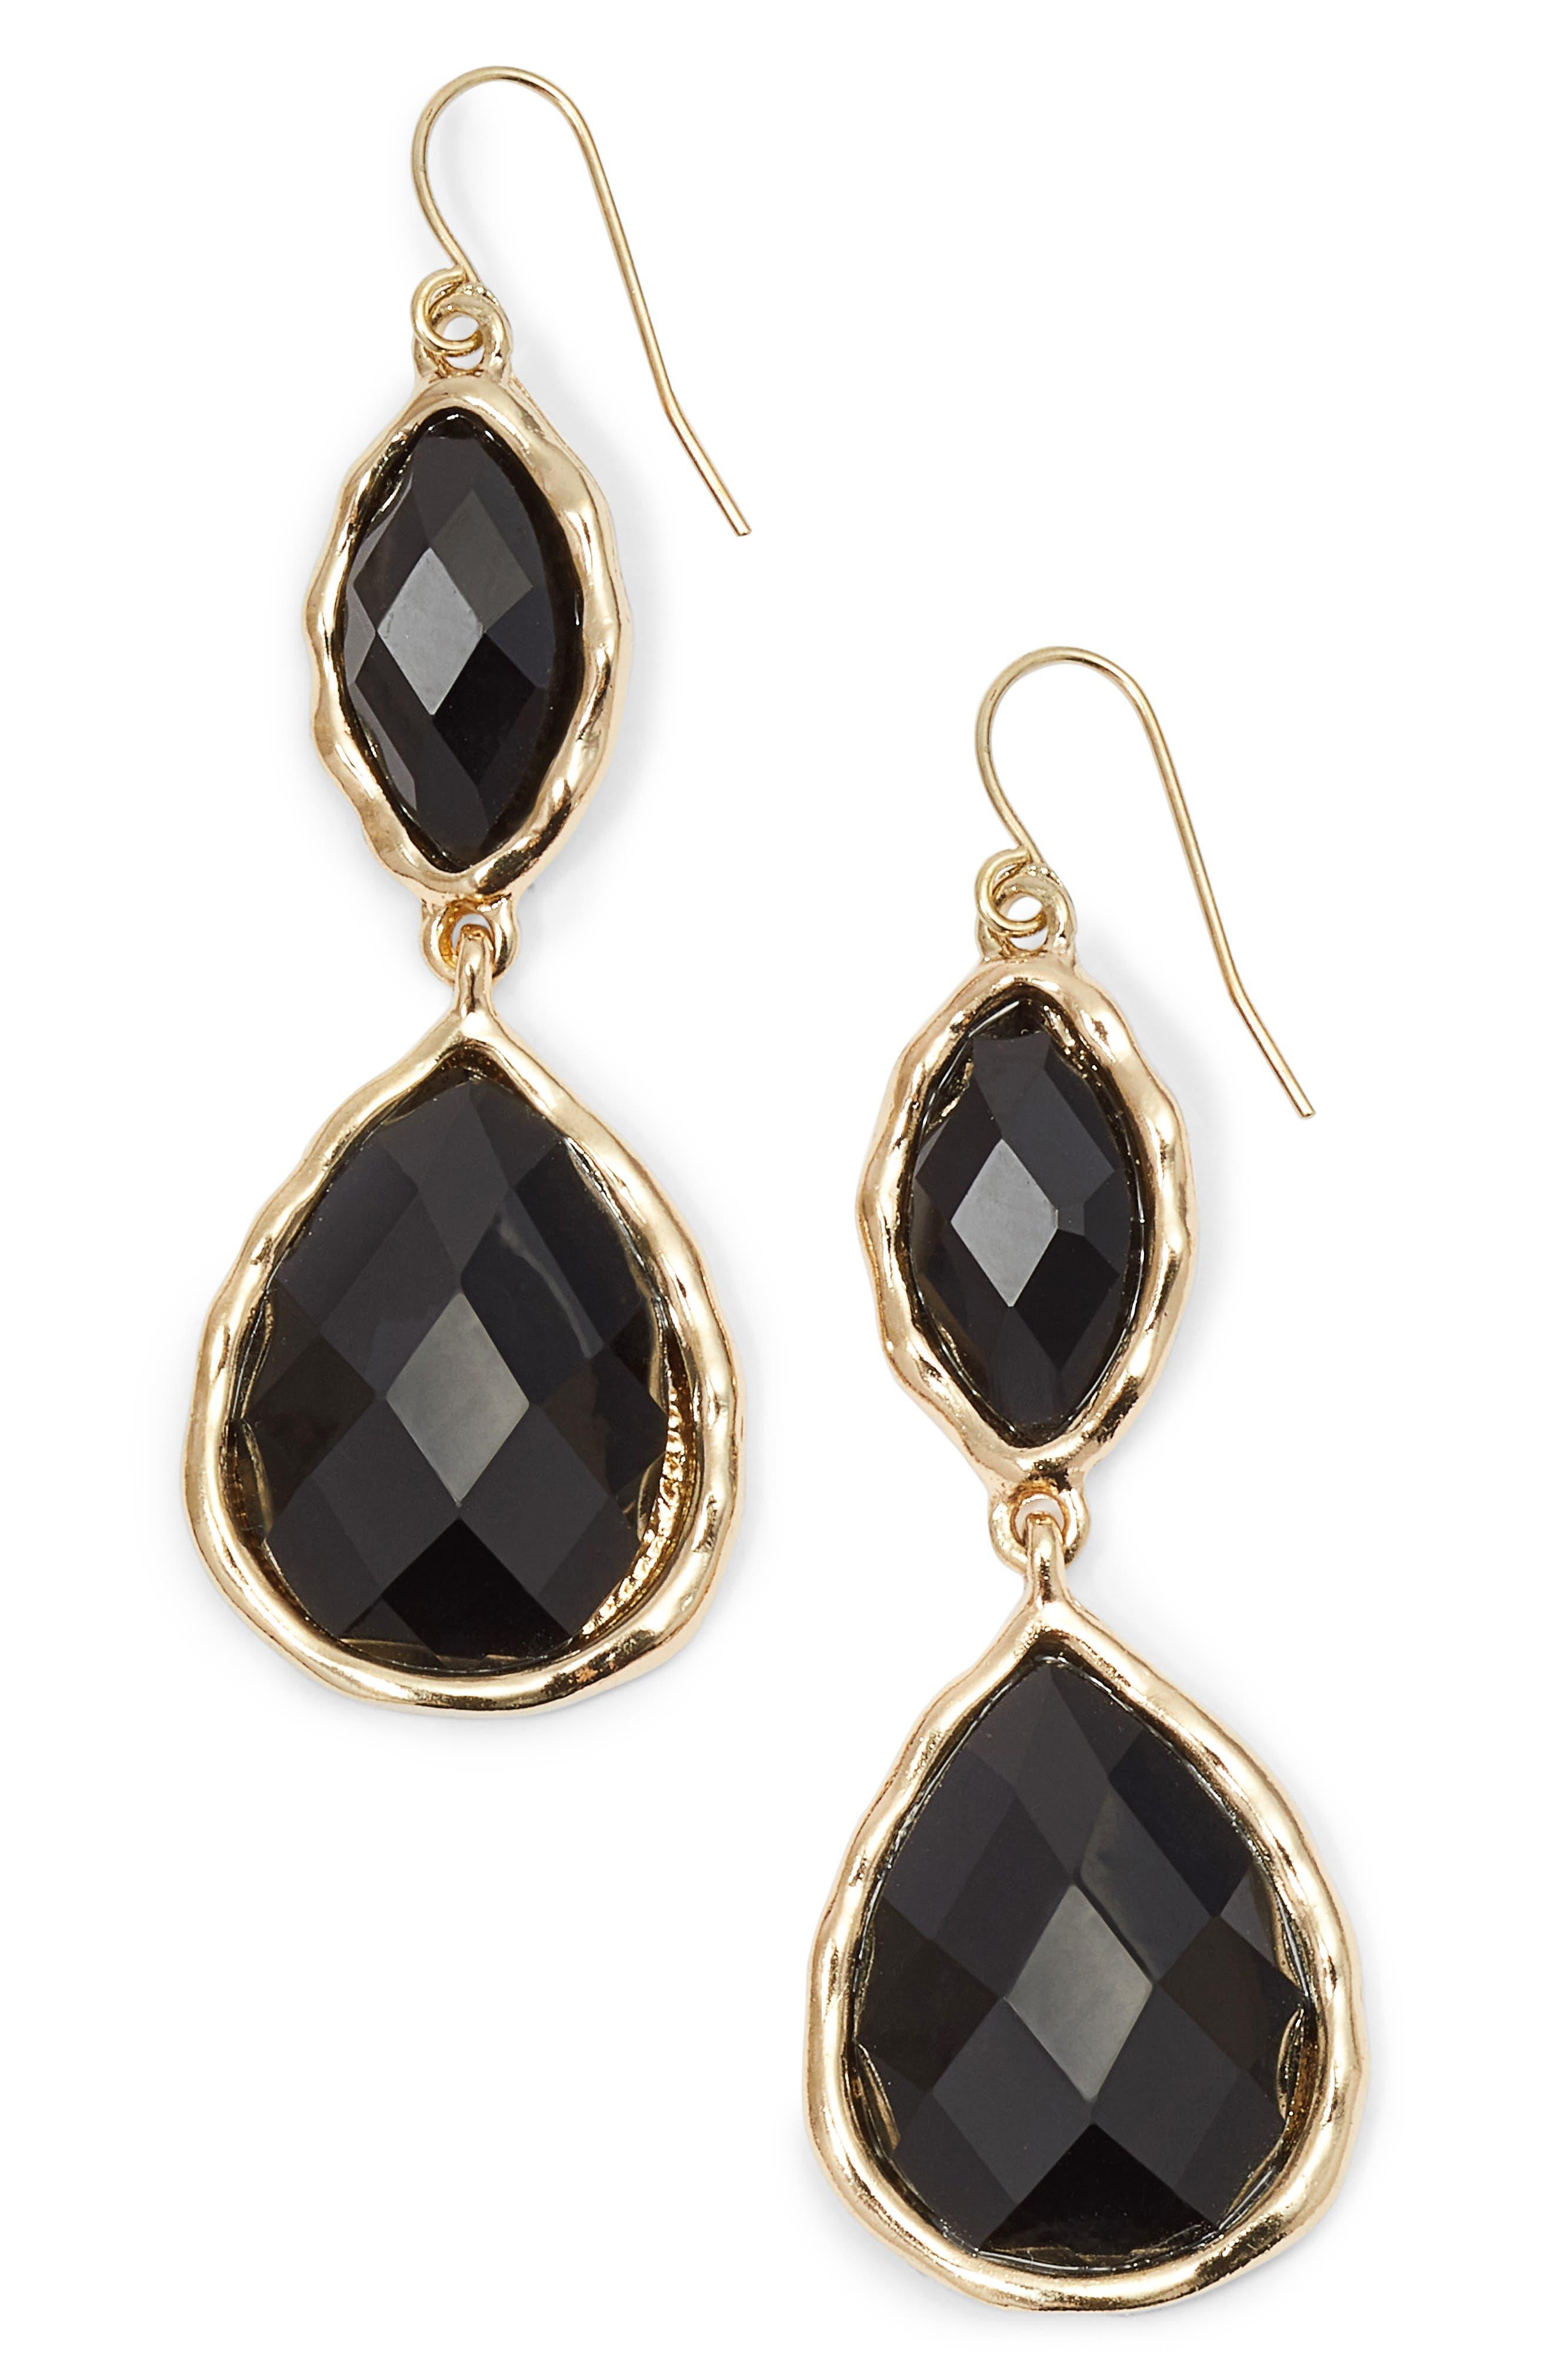 Stone Drop Earrings,                             Main thumbnail 1, color,                             001